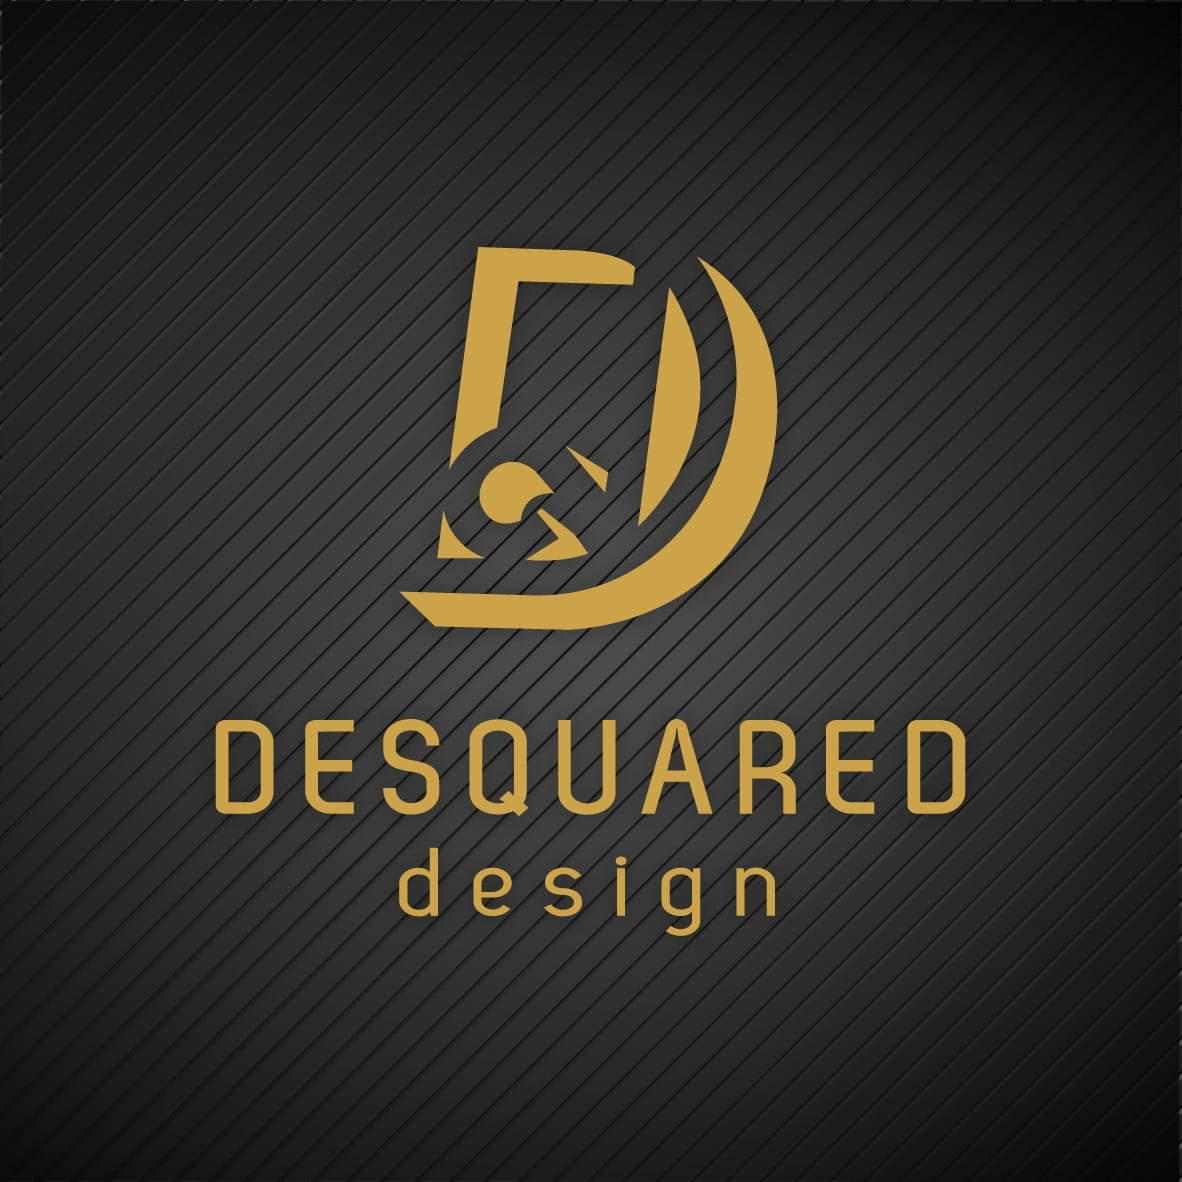 Desquared Design - Renovation